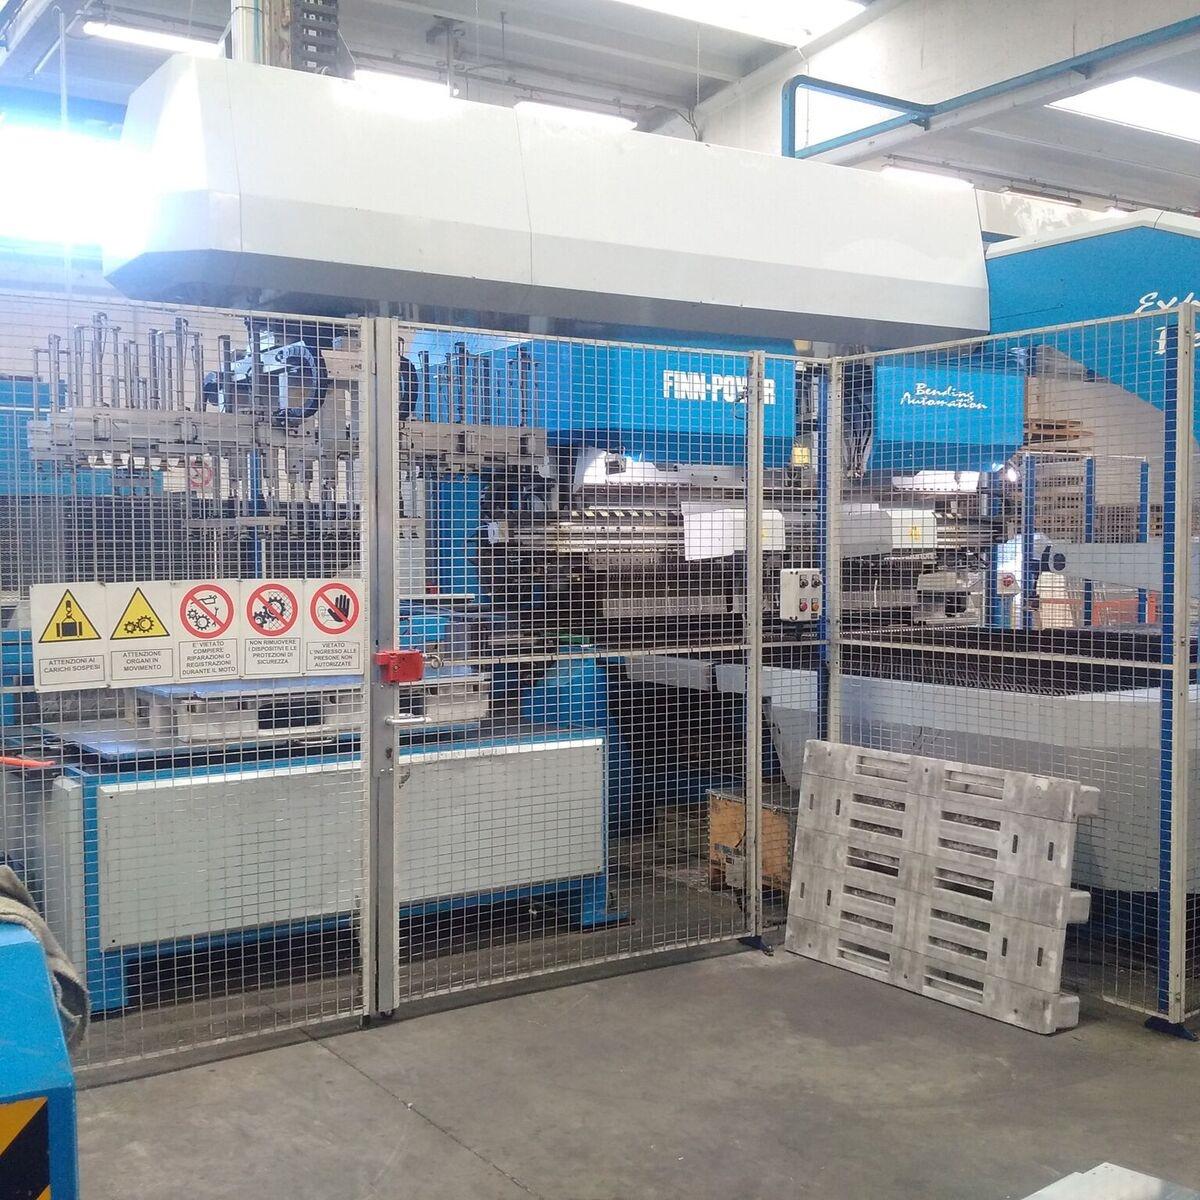 PANEL BENDERS: USED panel benders for sale, Salvagnini, Finn